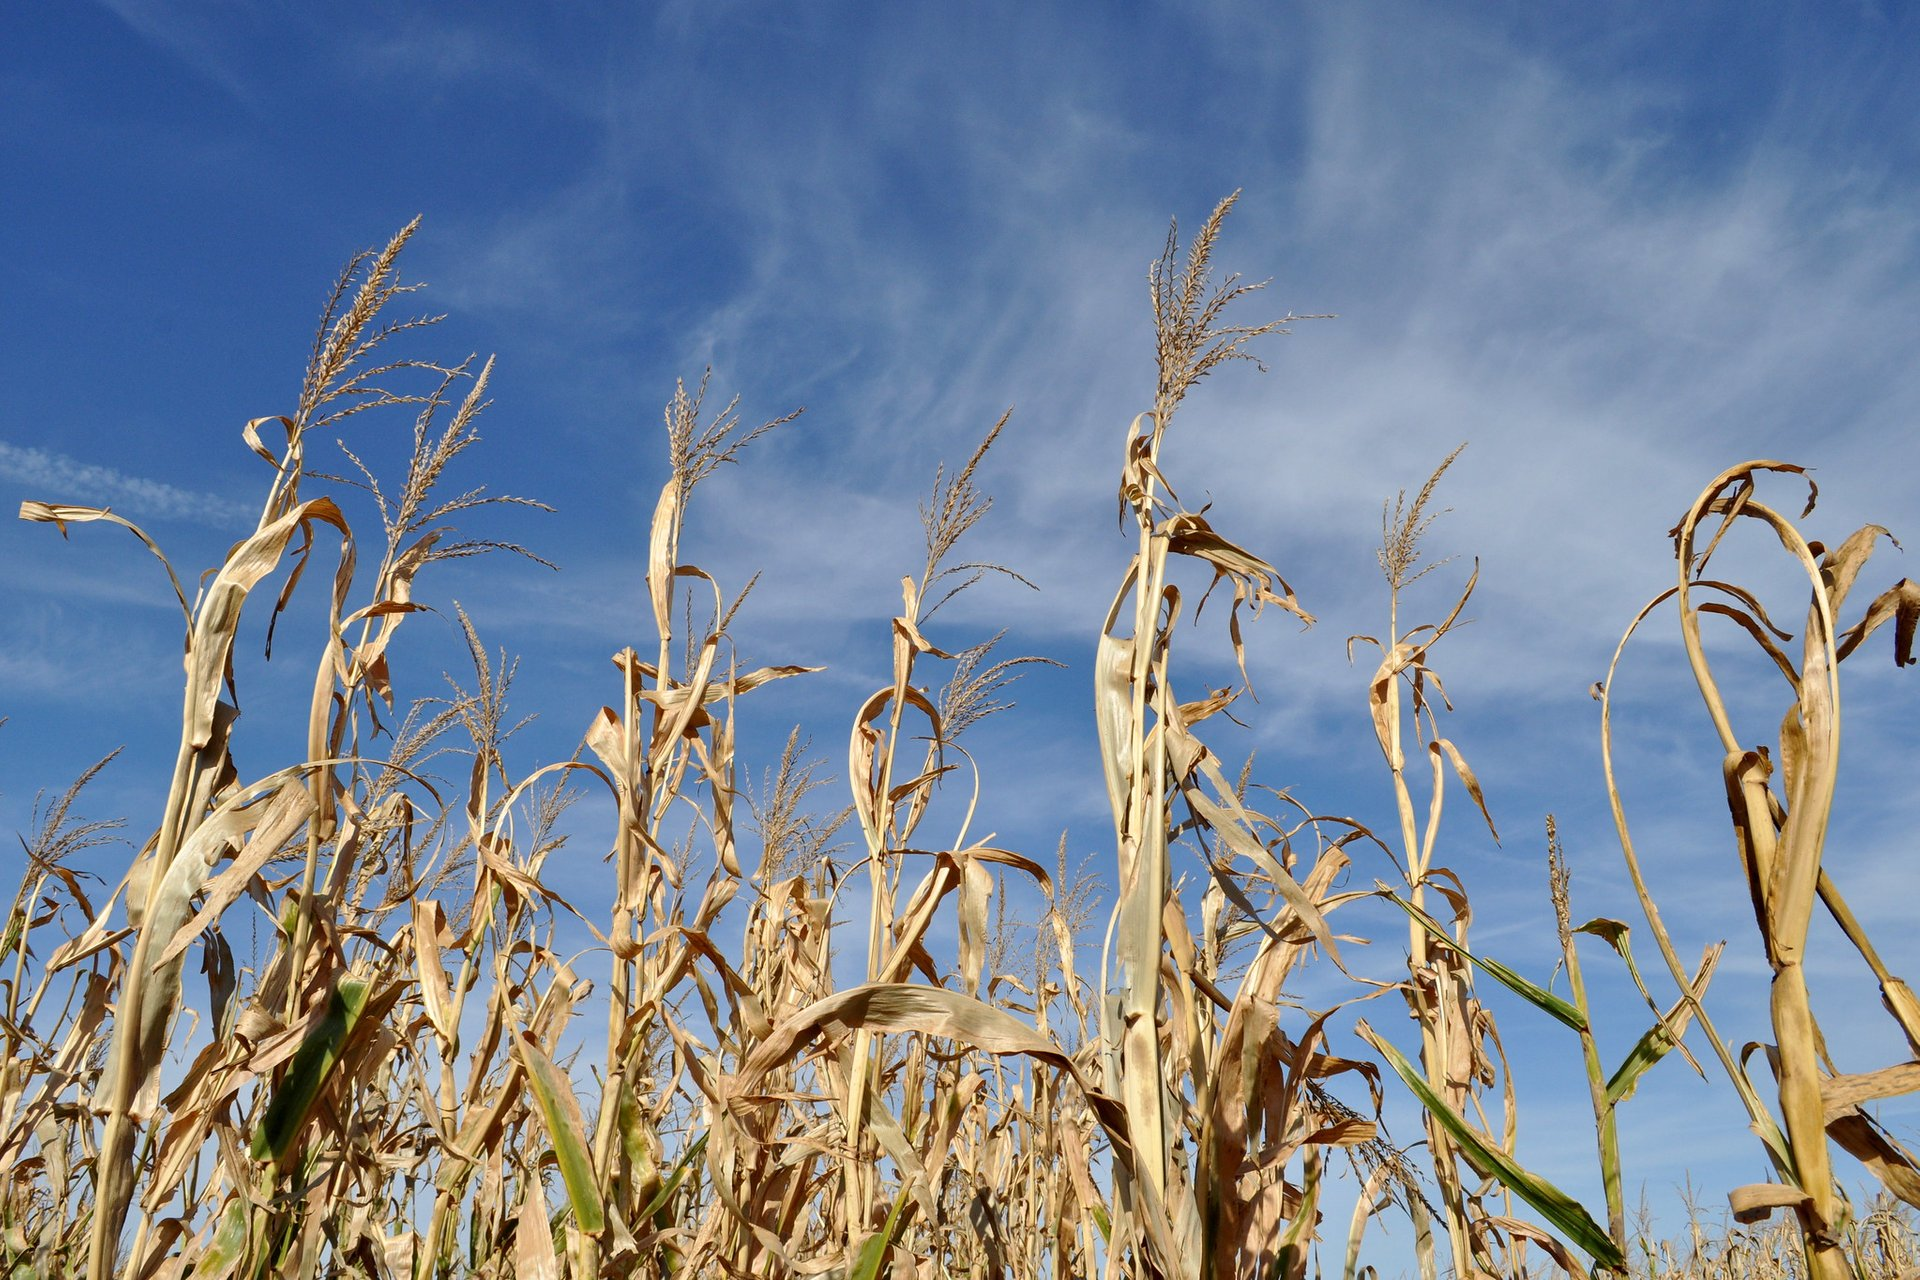 Best time for Richardson Adventure Farm Corn Maze in Illinois 2020